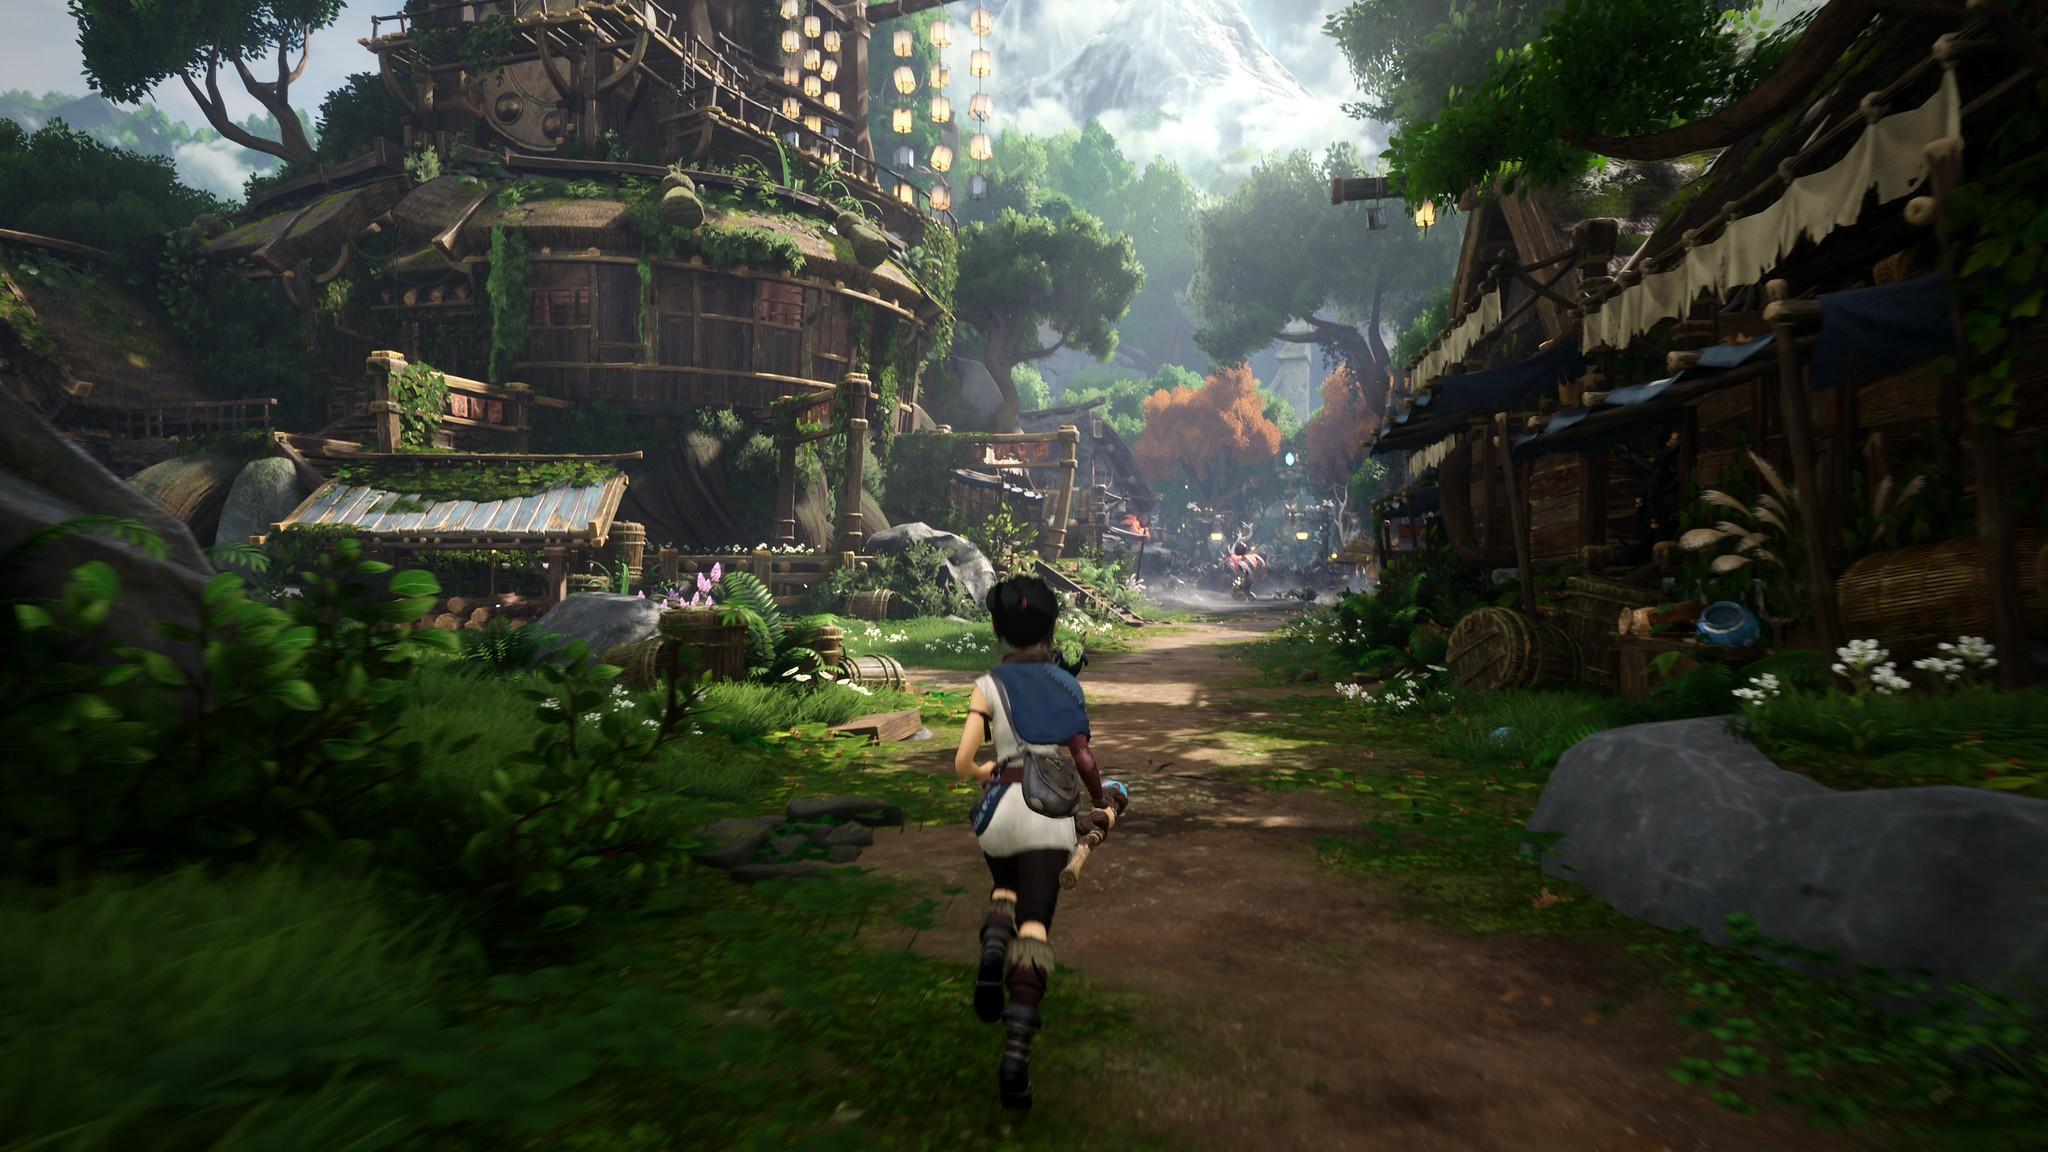 Summer of Gaming 2020 | اطلاعات جدیدی به همراه تریلری از گیمپلی Kena: Bridge of Spirits منتشر شد؛ فضای نه چندان زیاد مورد نیاز بازی